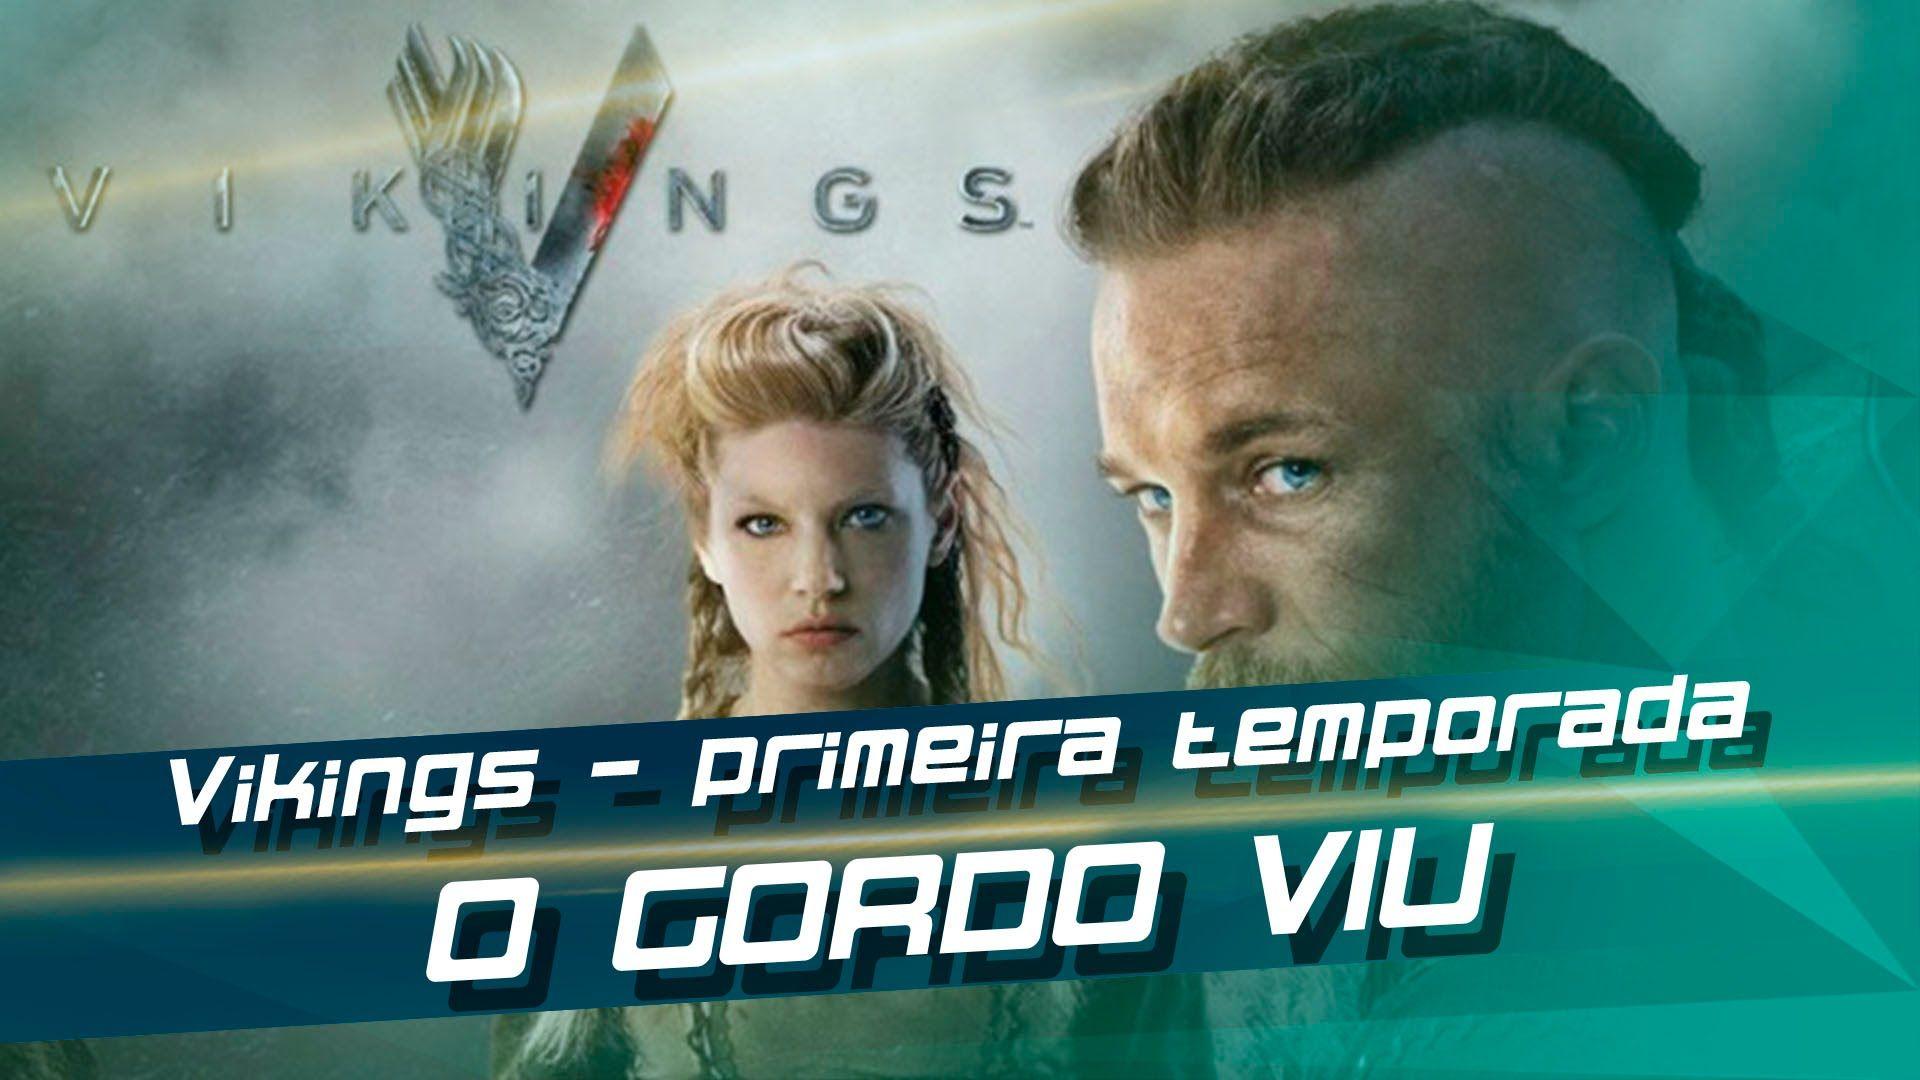 Vikings - primeira temporada - Gordo Viu